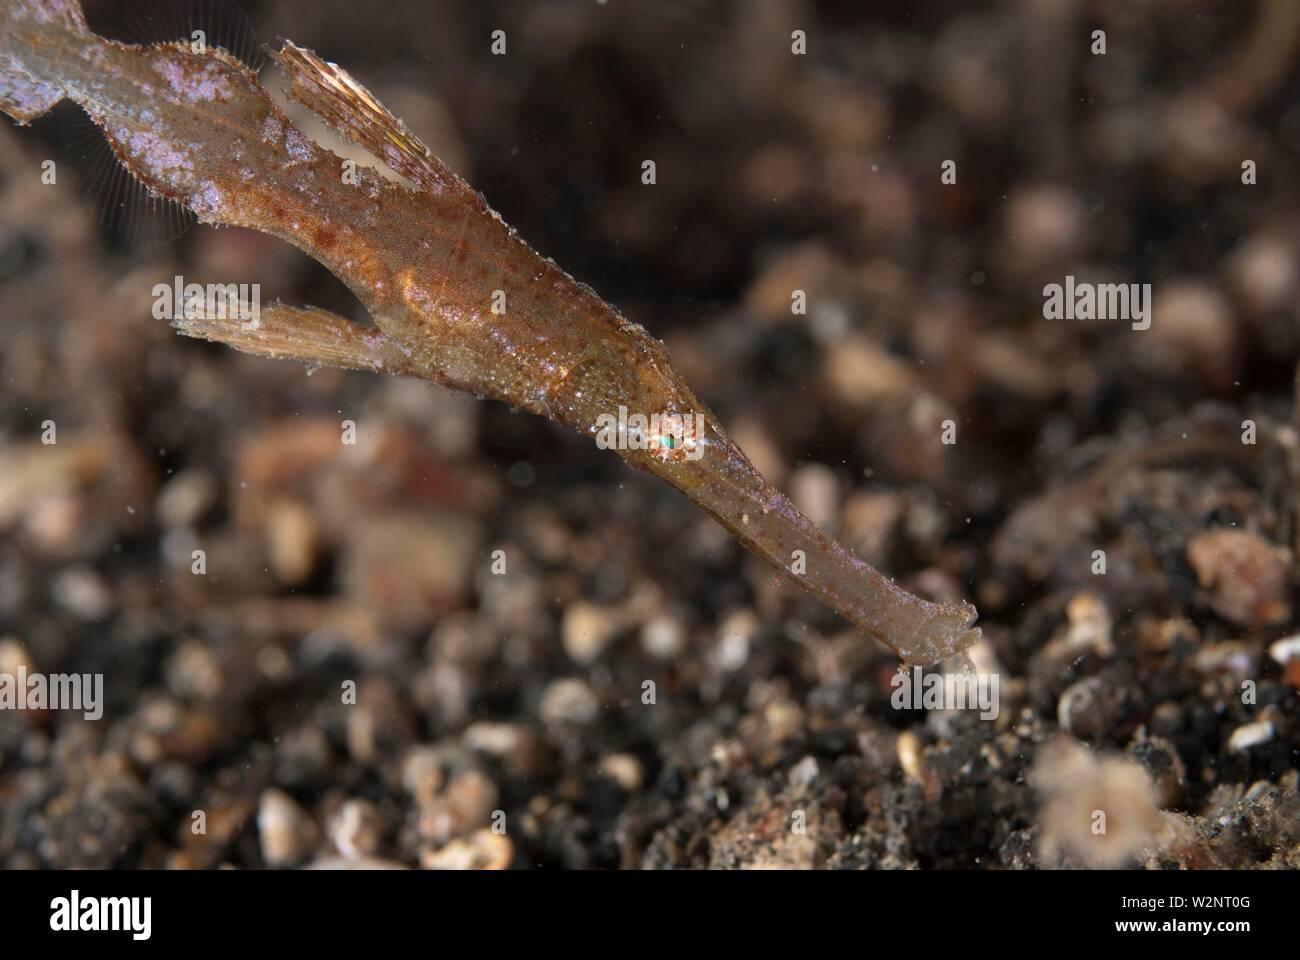 Syngnathe fantôme robuste (Solenostomus cyanopterus, famille Solenostomidae), Larry Retak, site de plongée Détroit de Lembeh, Sulawesi, Indonésie. Photo Stock